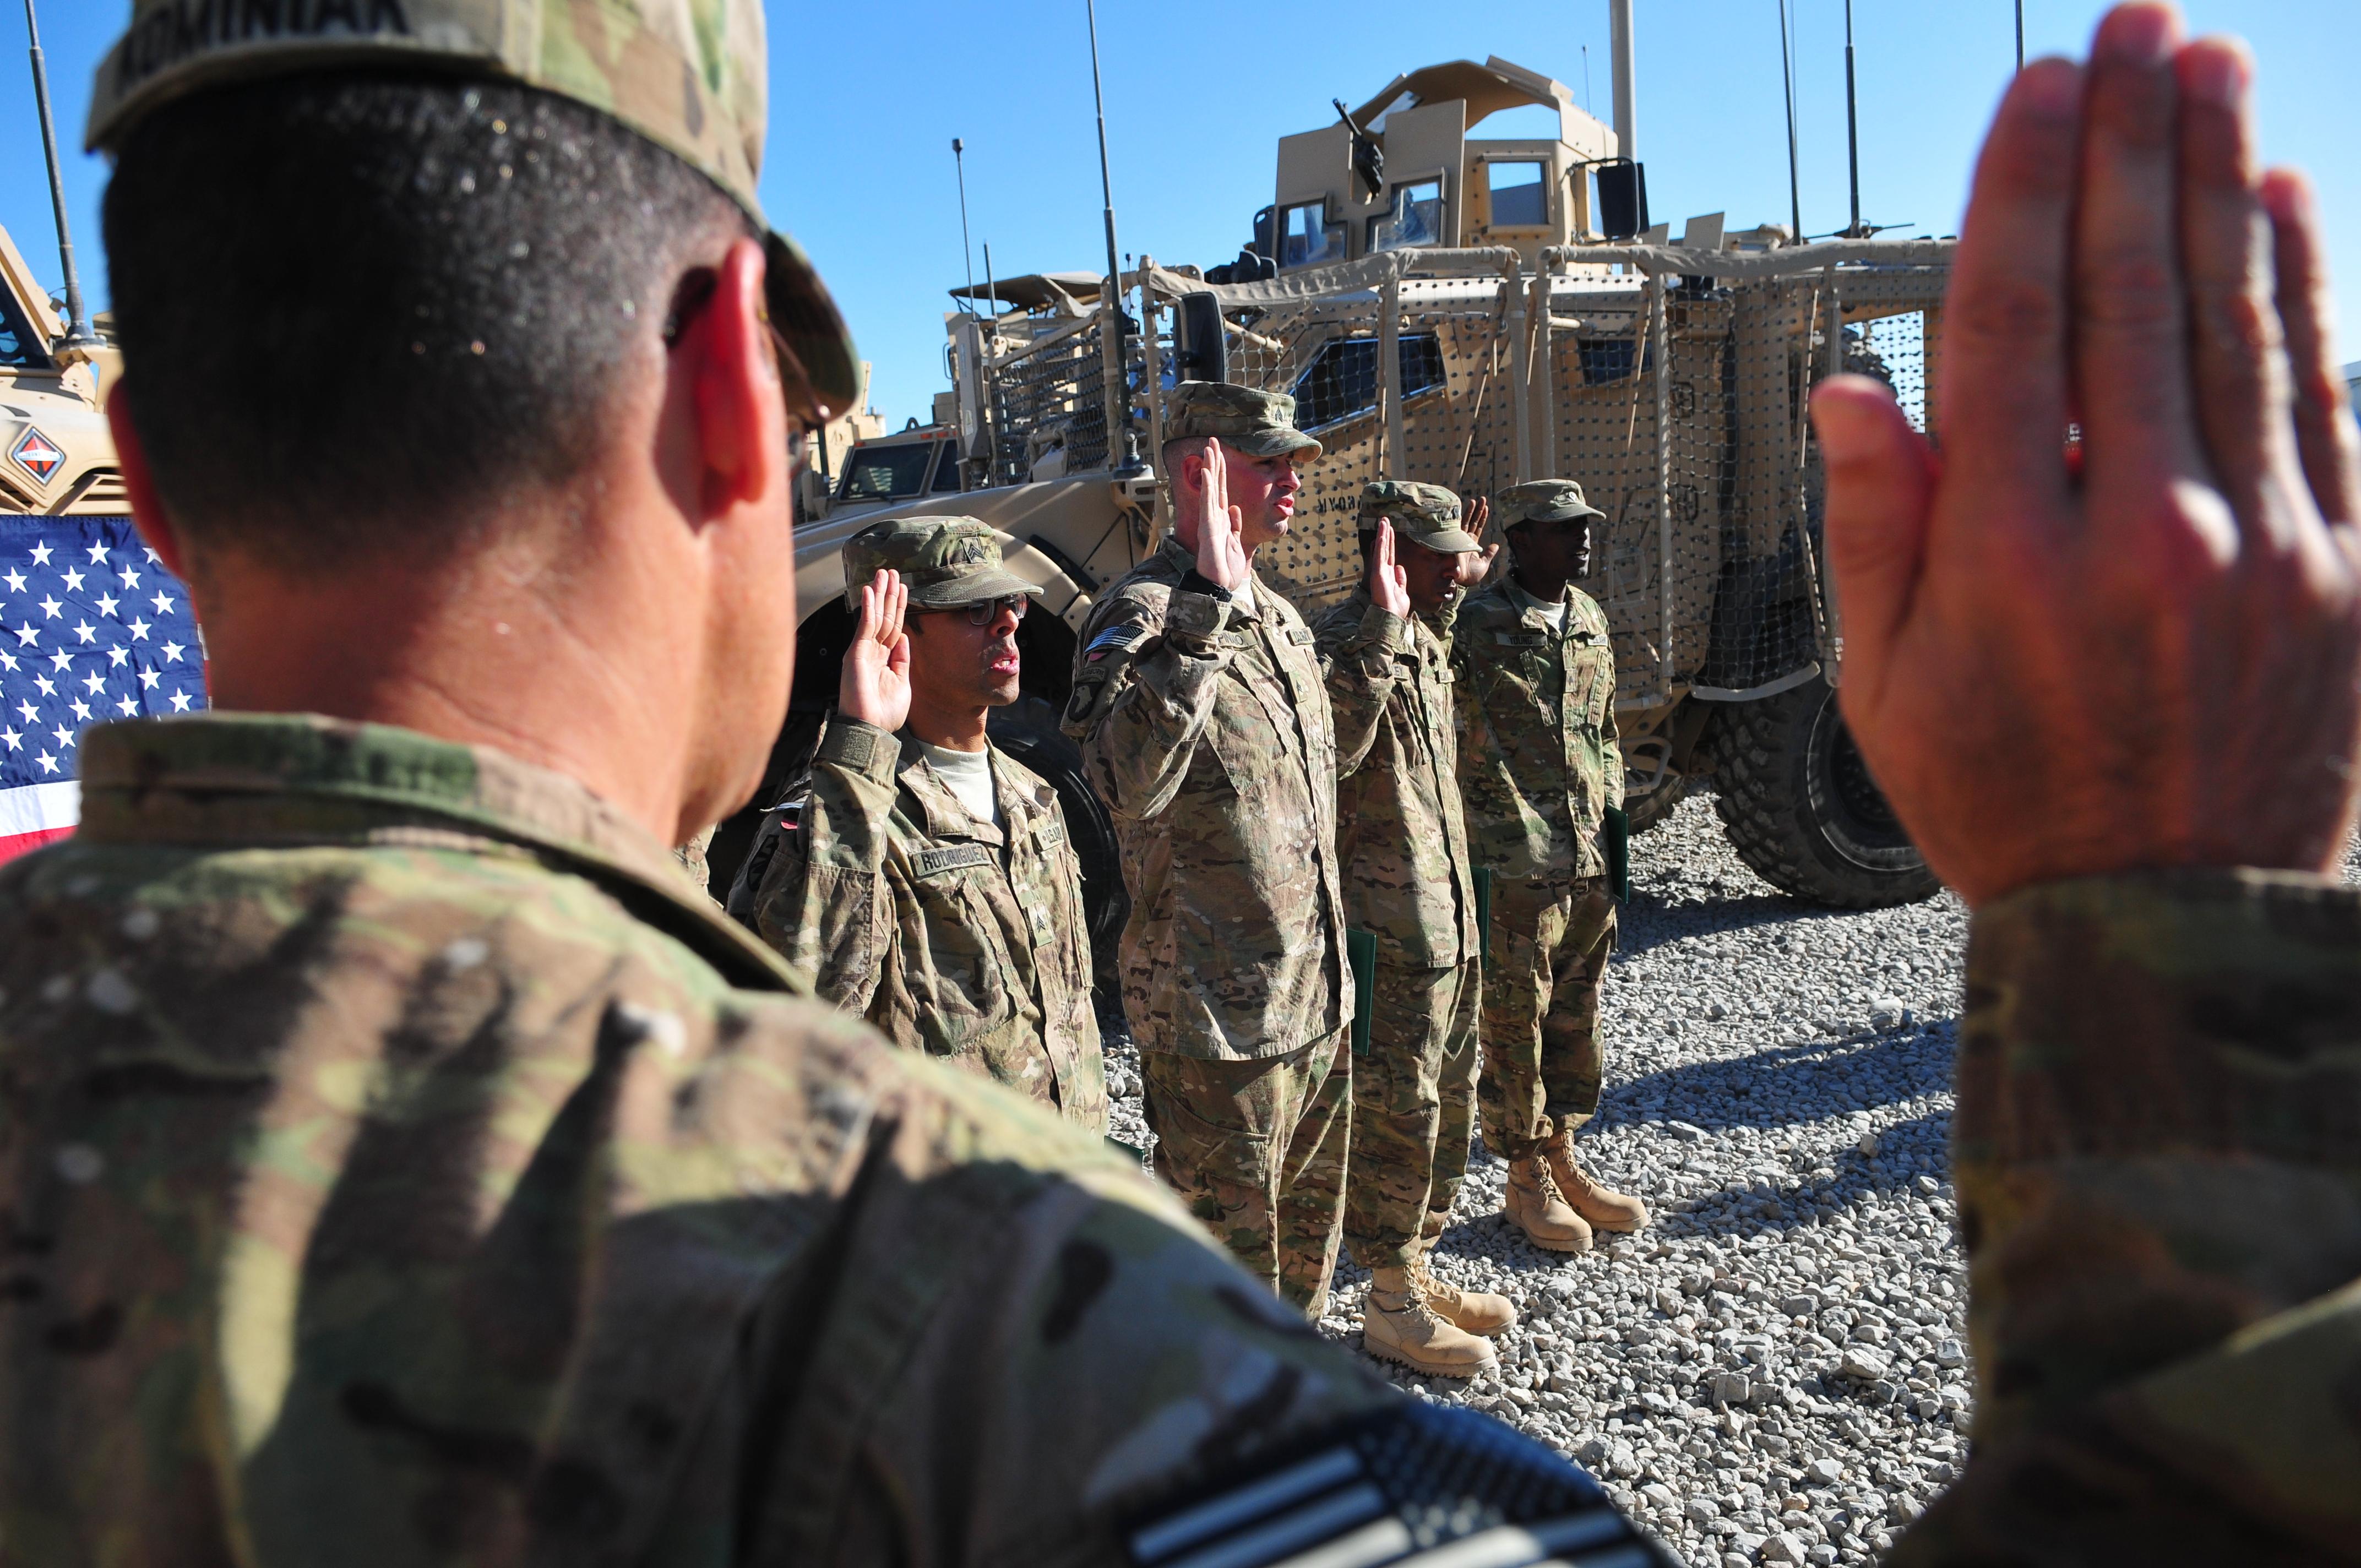 Army ups retention bonuses across all eligible MOSs